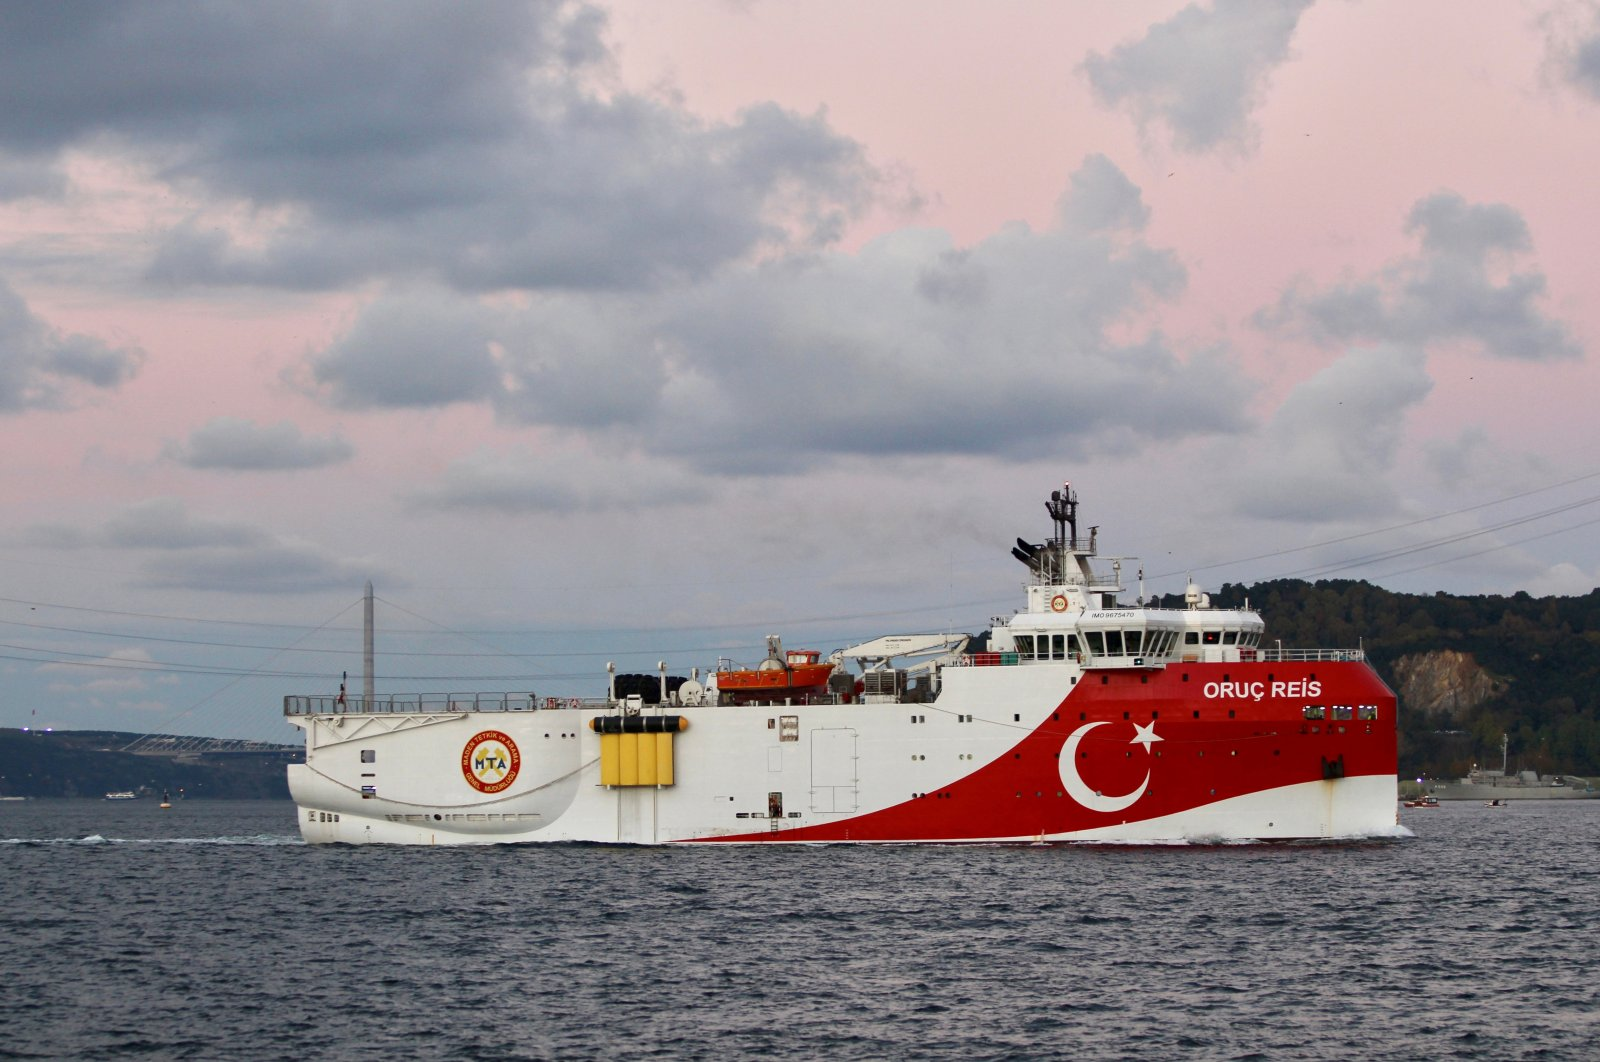 Turkish seismic research vessel Oruc Reis sails in the Bosphorus in Istanbul, Turkey, Nov. 12, 2018. (Reuters File Photo)